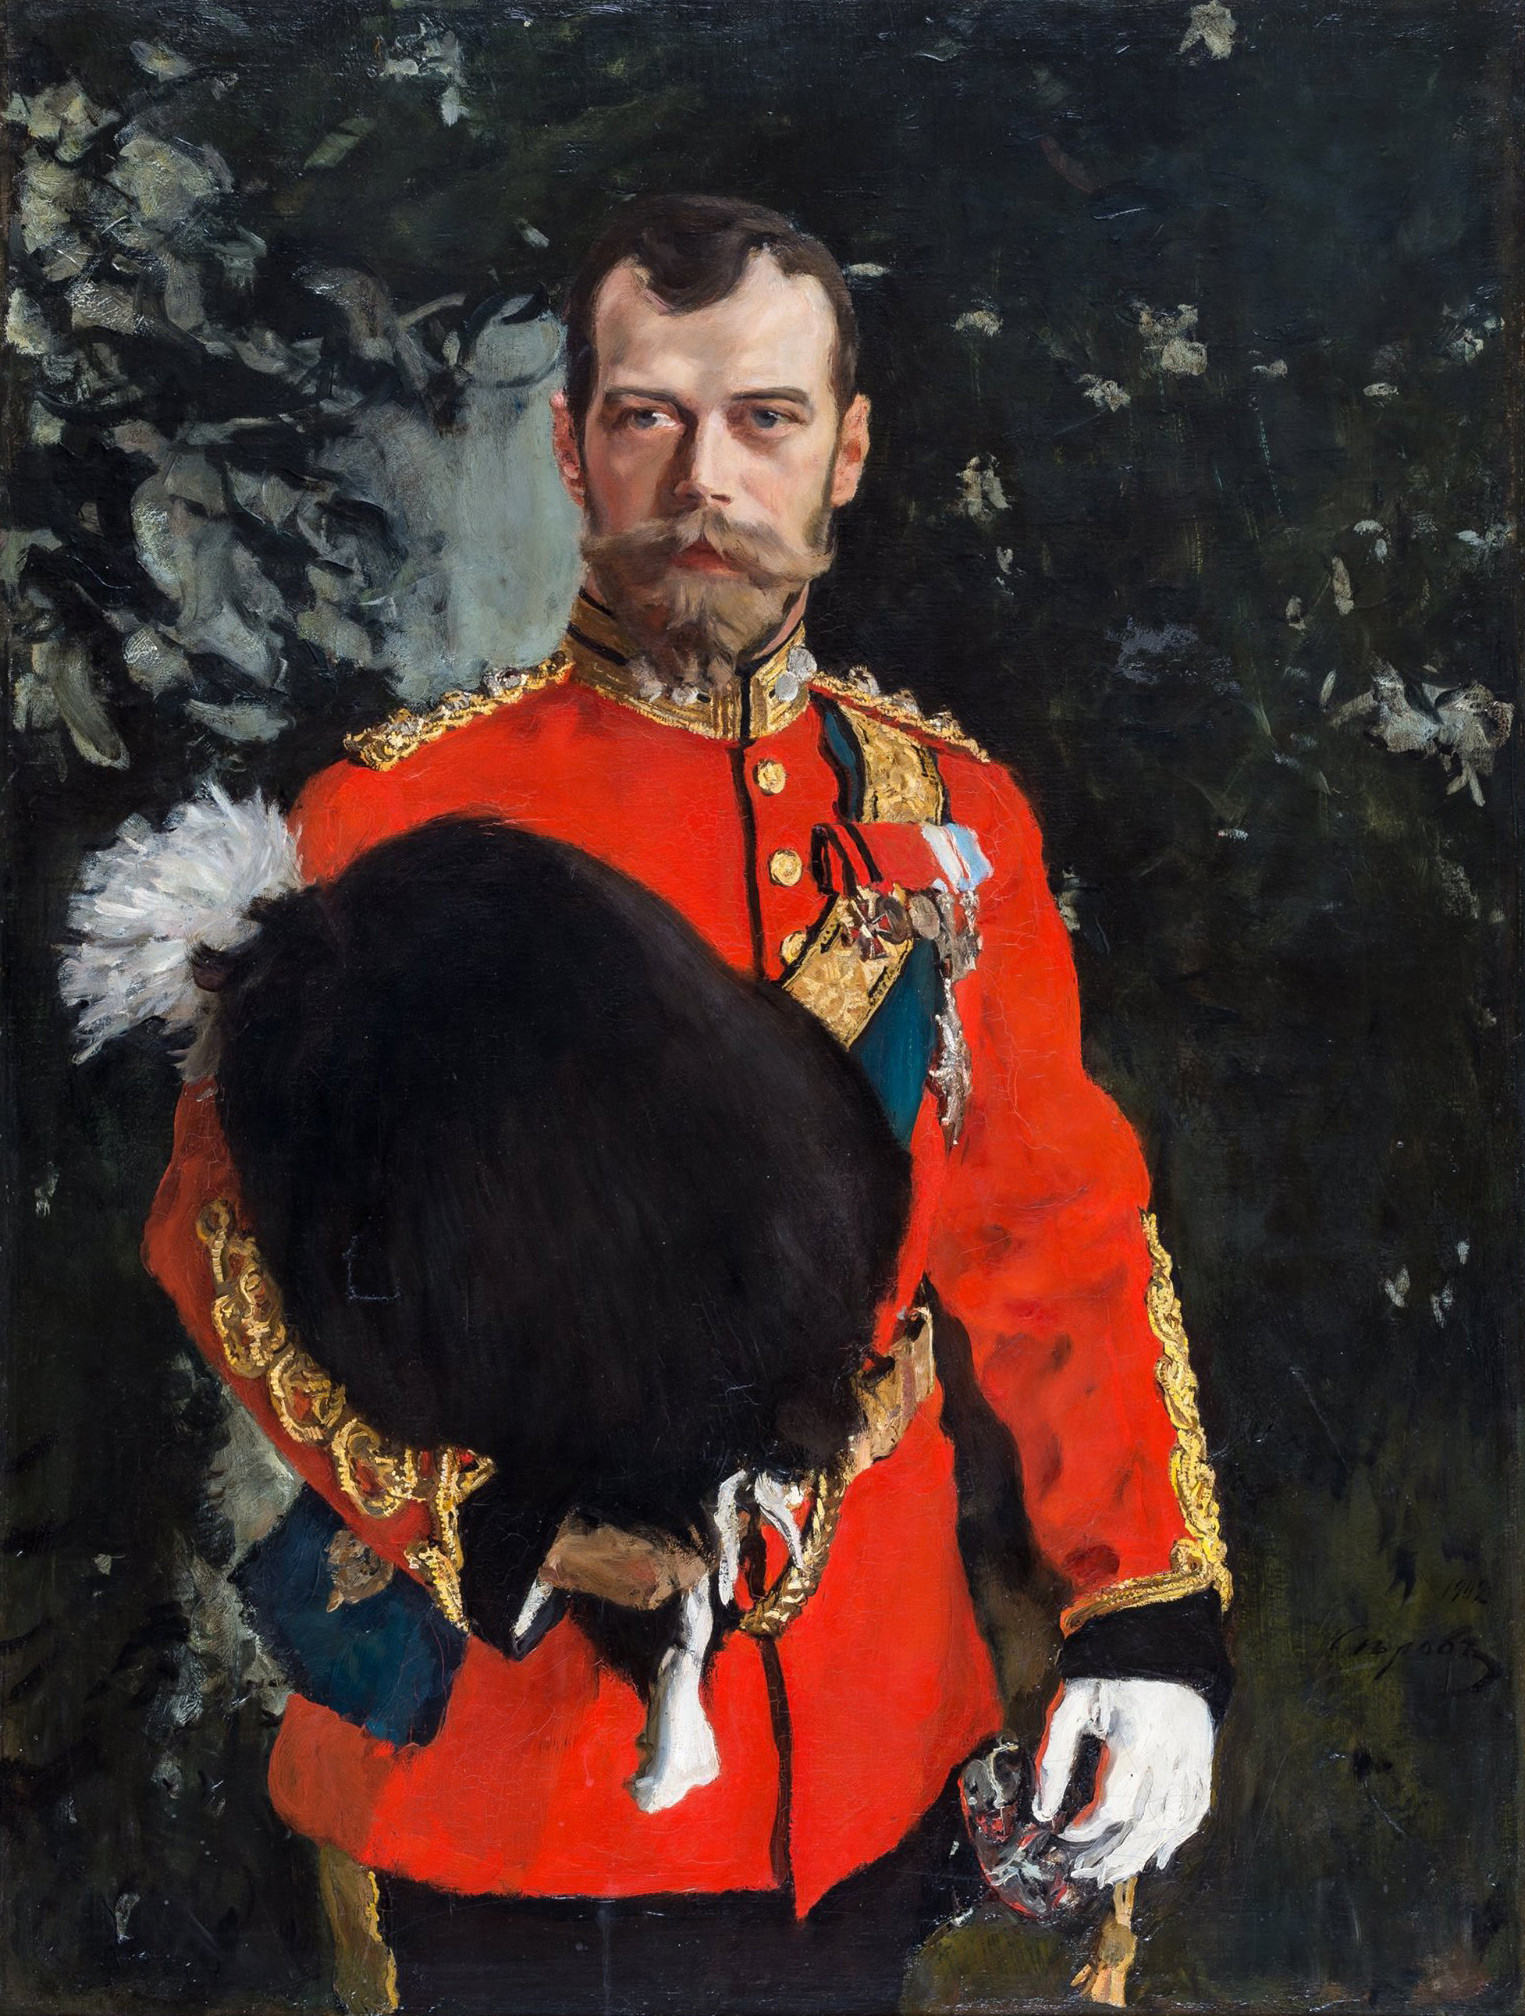 Nicholas II, colonel-in-chief of the Royal Scots Greys', 1902. The Emperor in full dress uniform as Colonel-in-Chief of the 2nd Dragoons (Royal Scots Greys). Artist Valentin Serov.